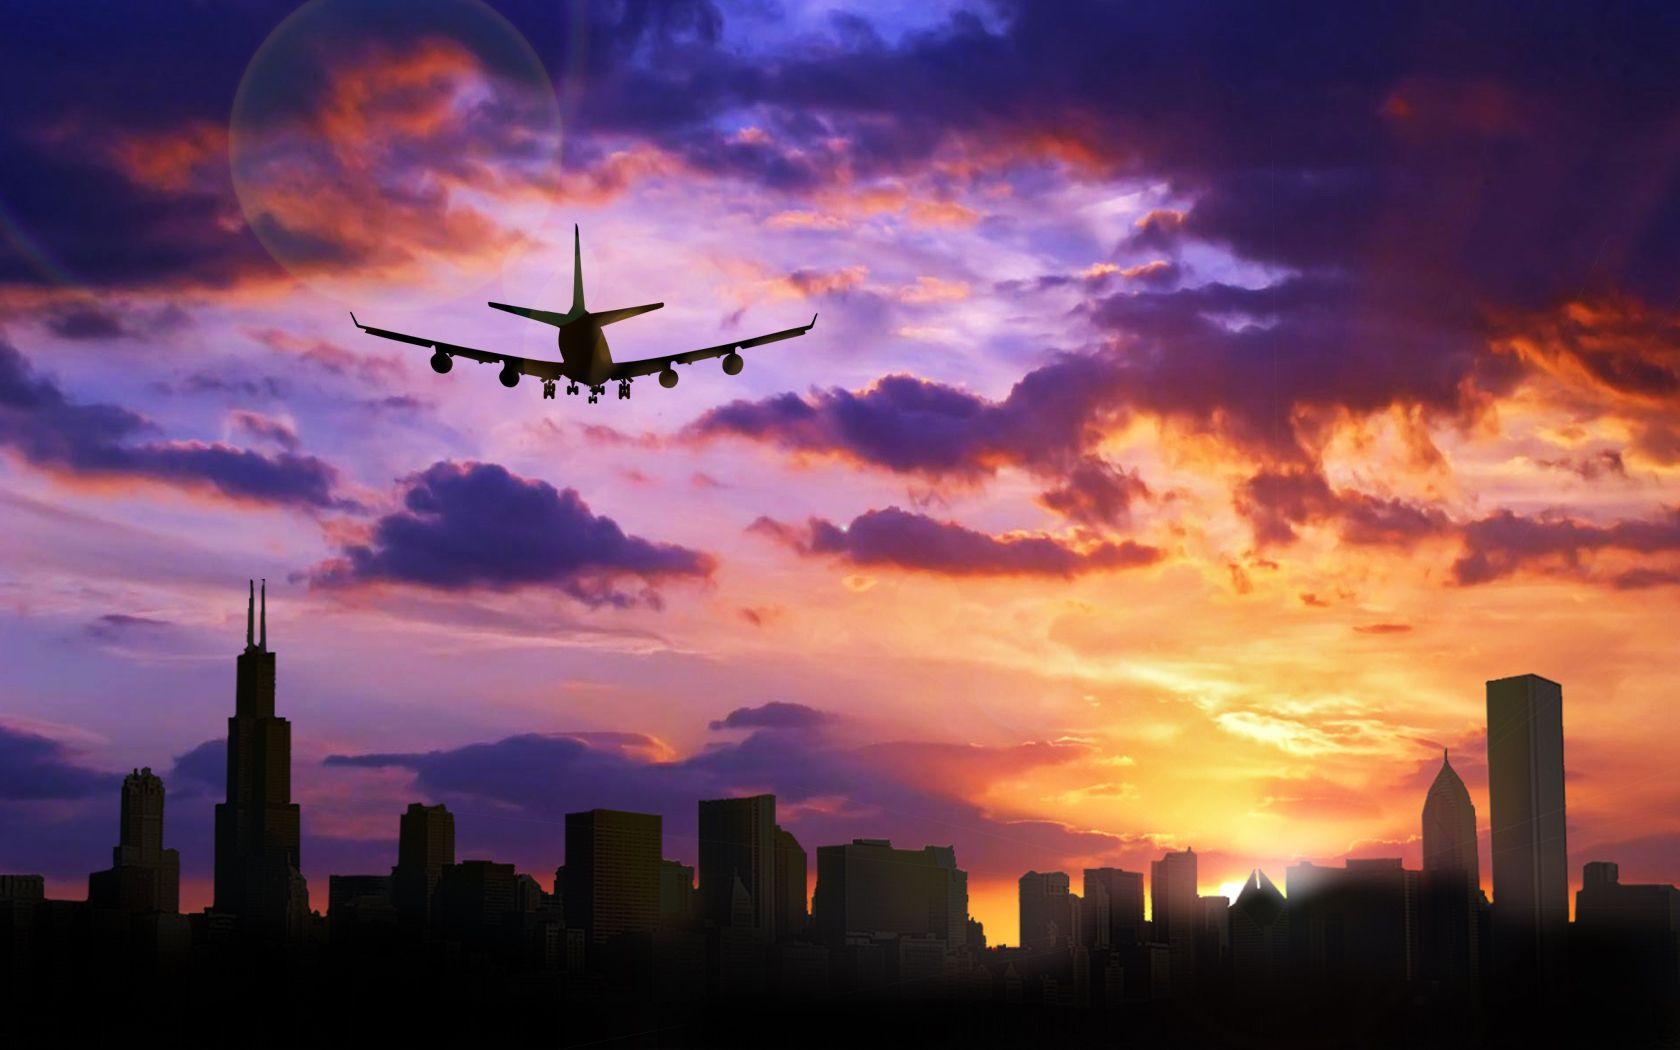 Plane Flying Over Chicago, Illinois - Wallpaper #36114